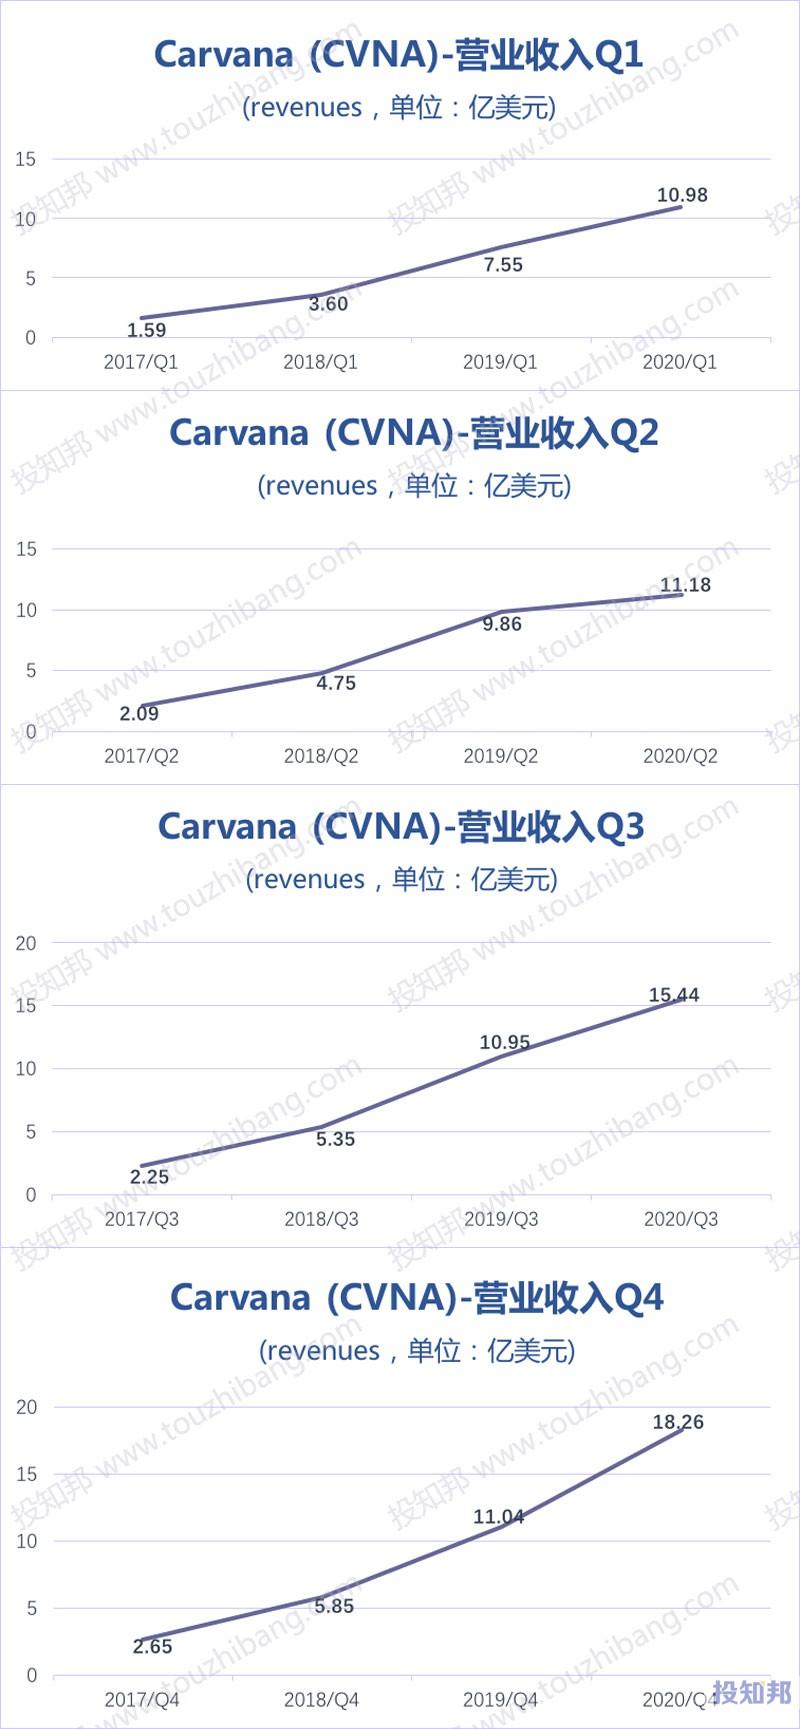 Carvana(CVNA)核心财报数据图示(2017~2020年,更新)